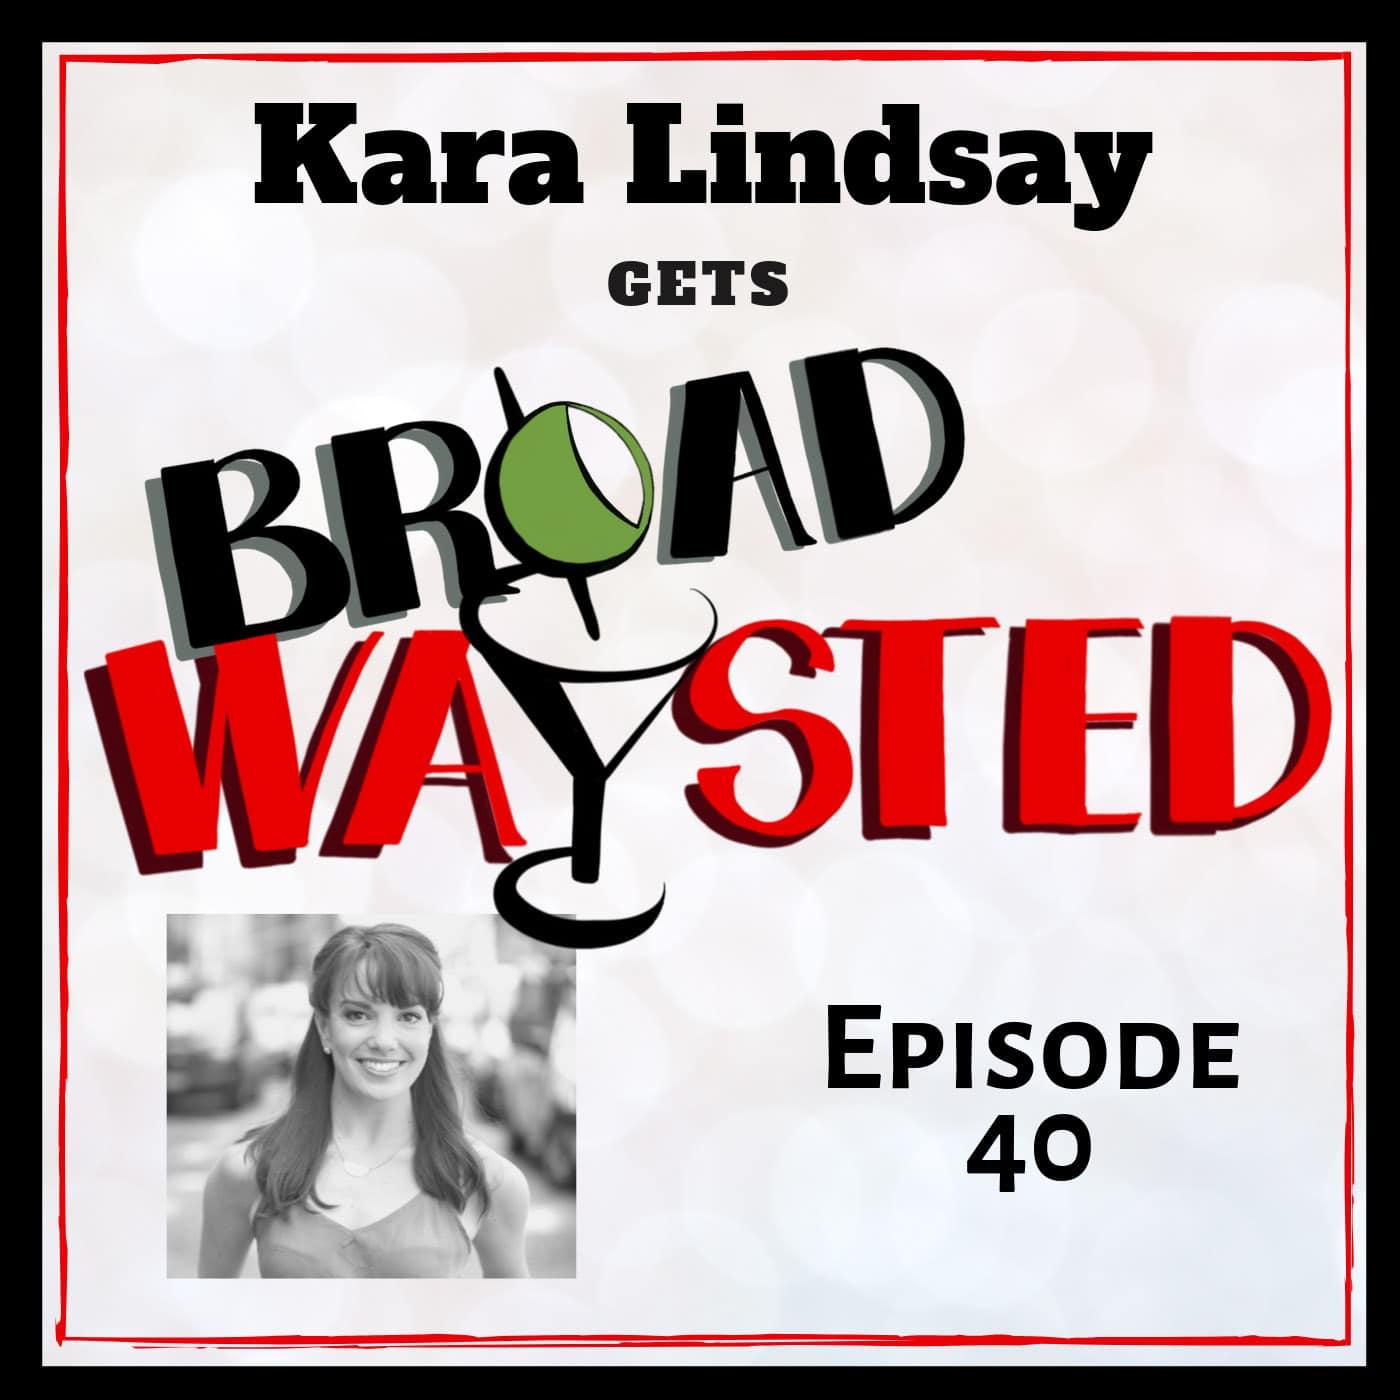 Broadwaysted Ep 40 Kara Lindsay